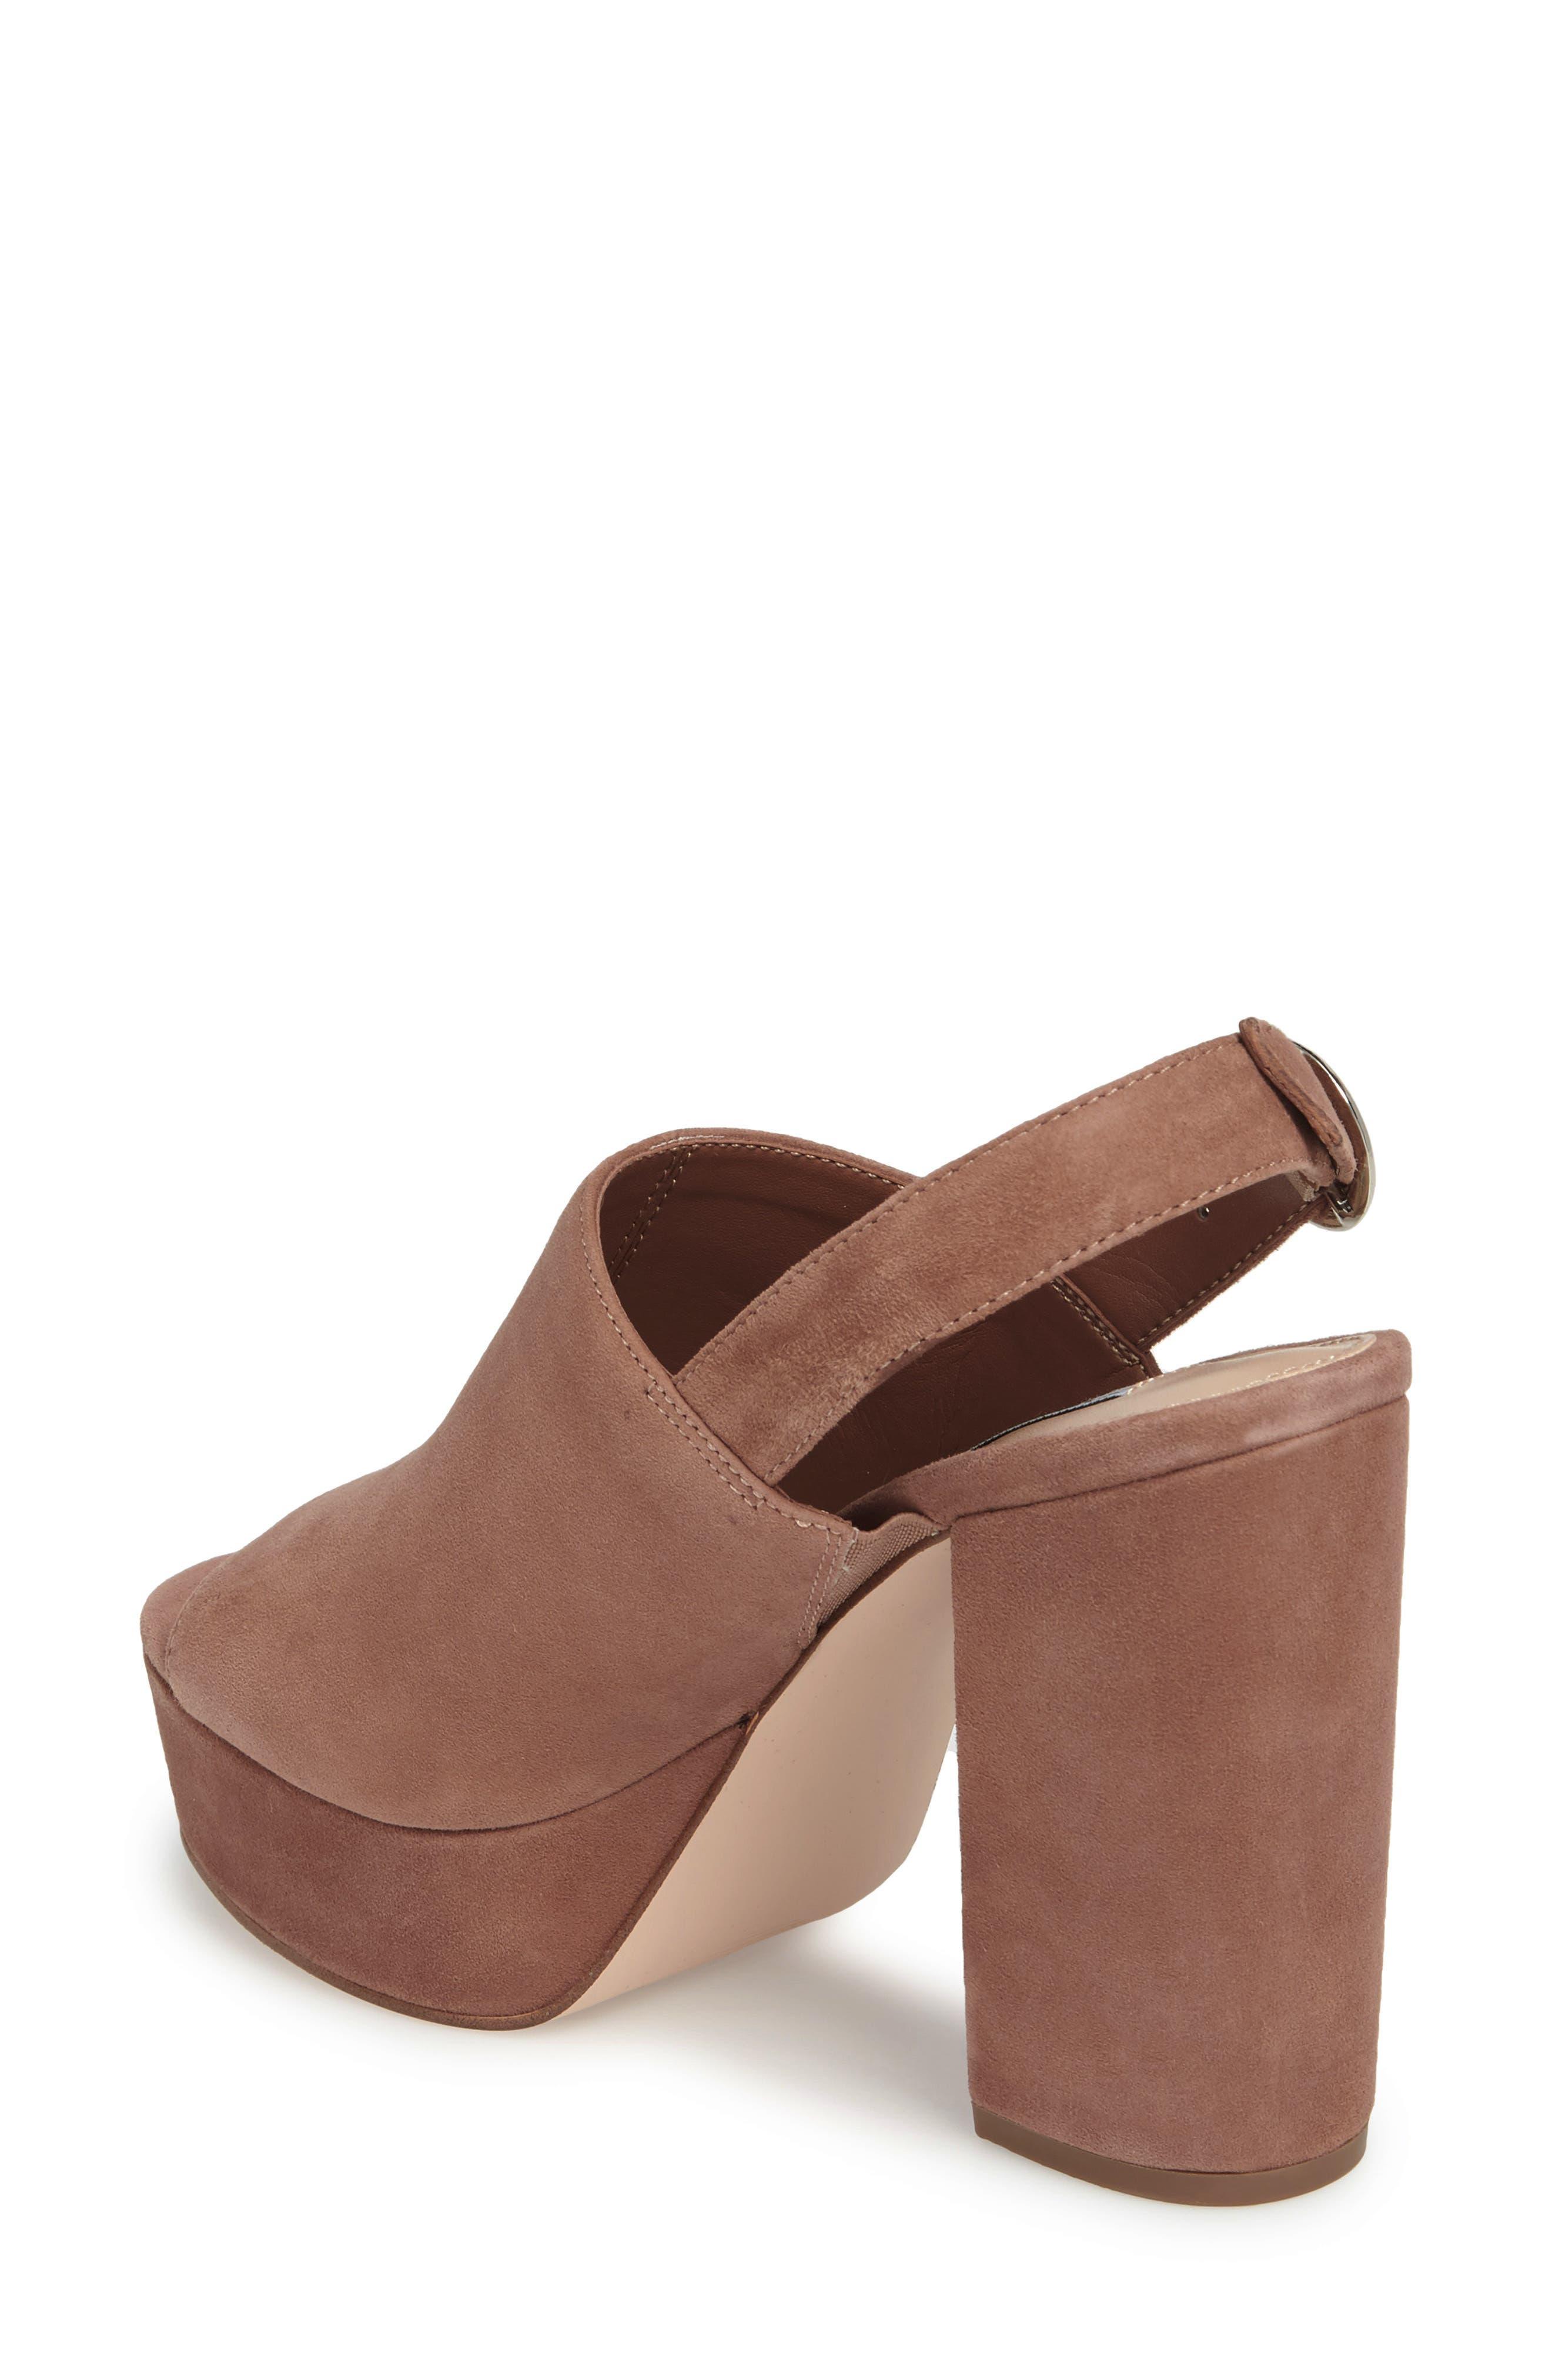 Carter Slingback Platform Sandal,                             Alternate thumbnail 4, color,